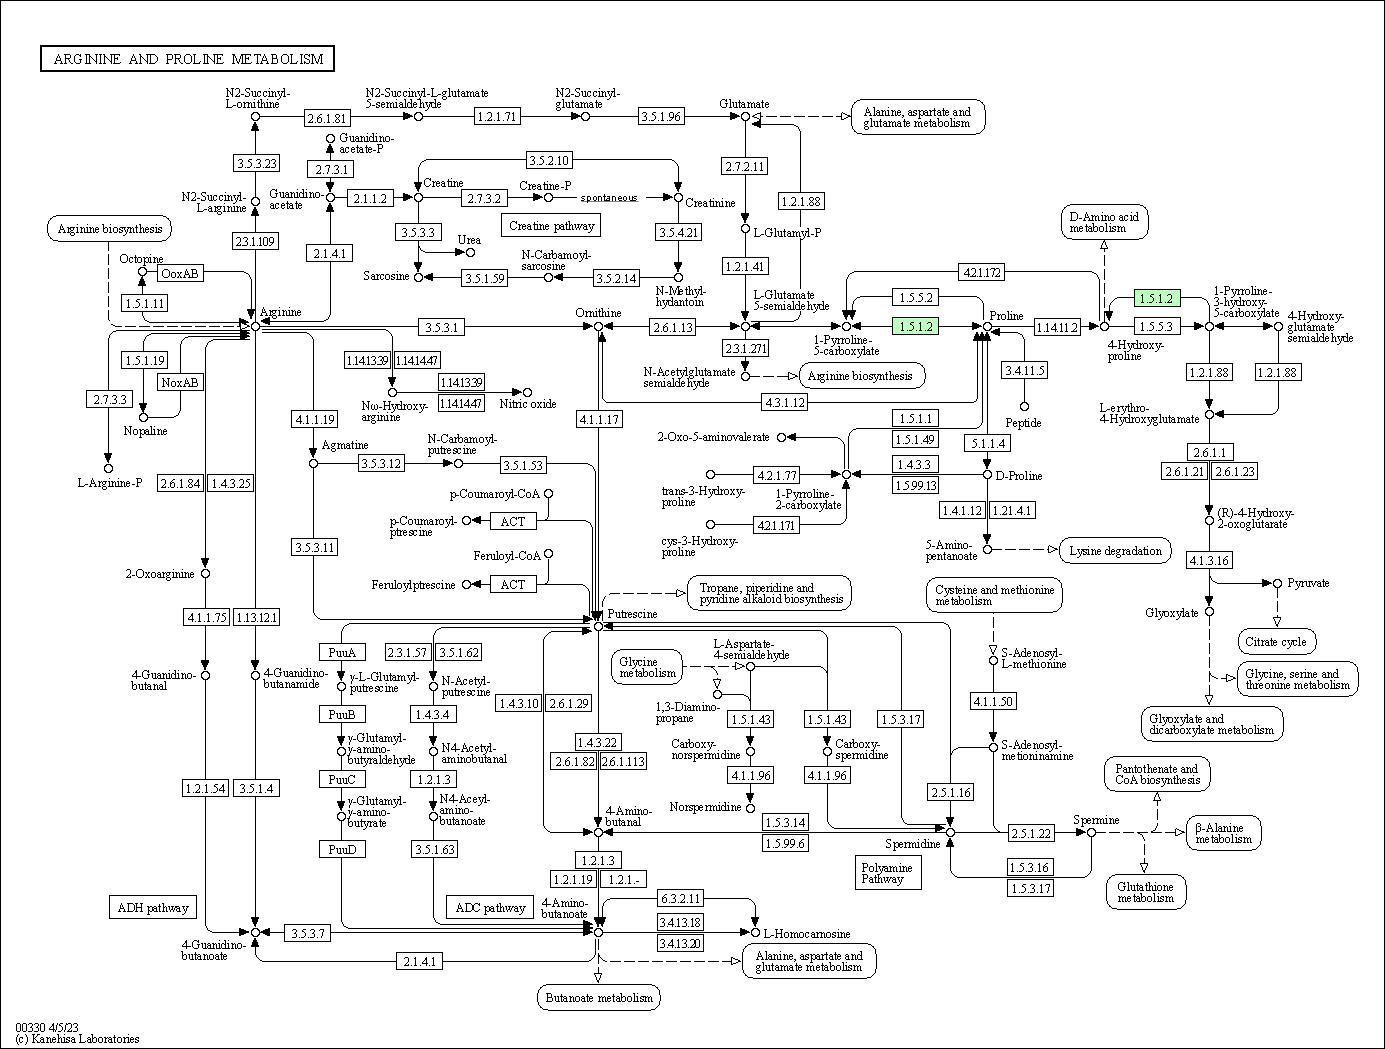 KEGG PATHWAY: Arginine and proline metabolism - Mesoplasma